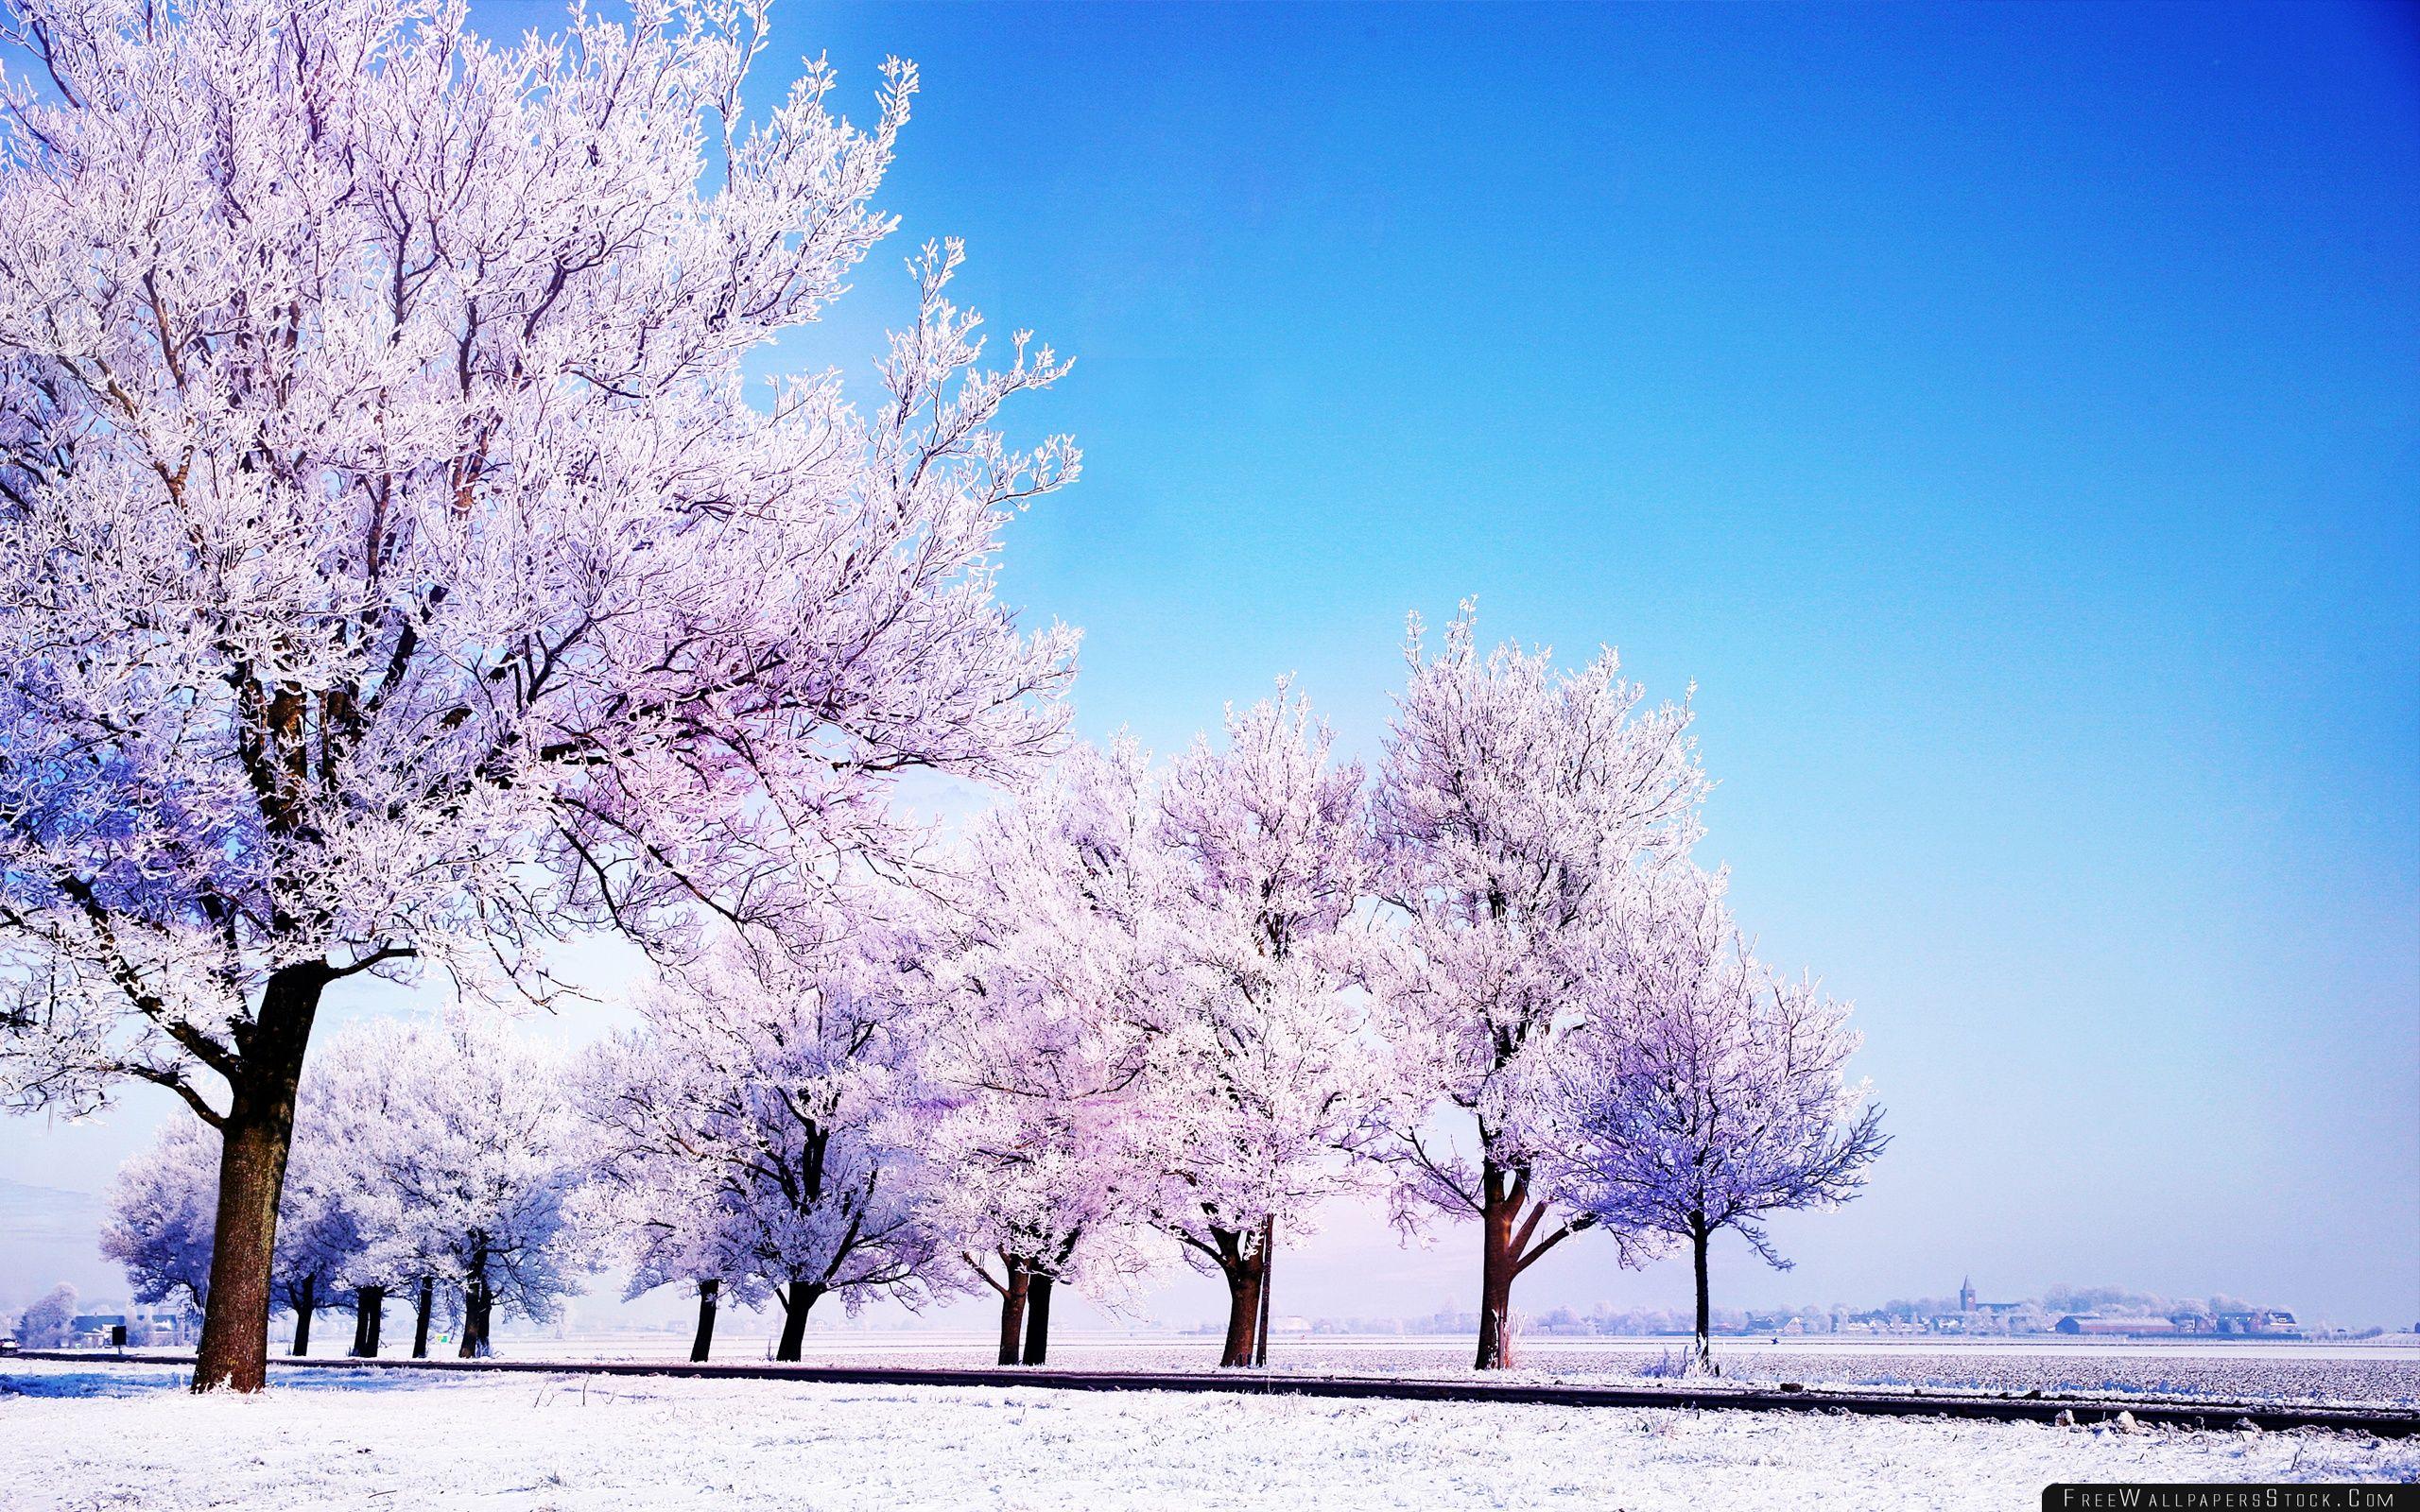 Download Free Wallpaper Winter Background